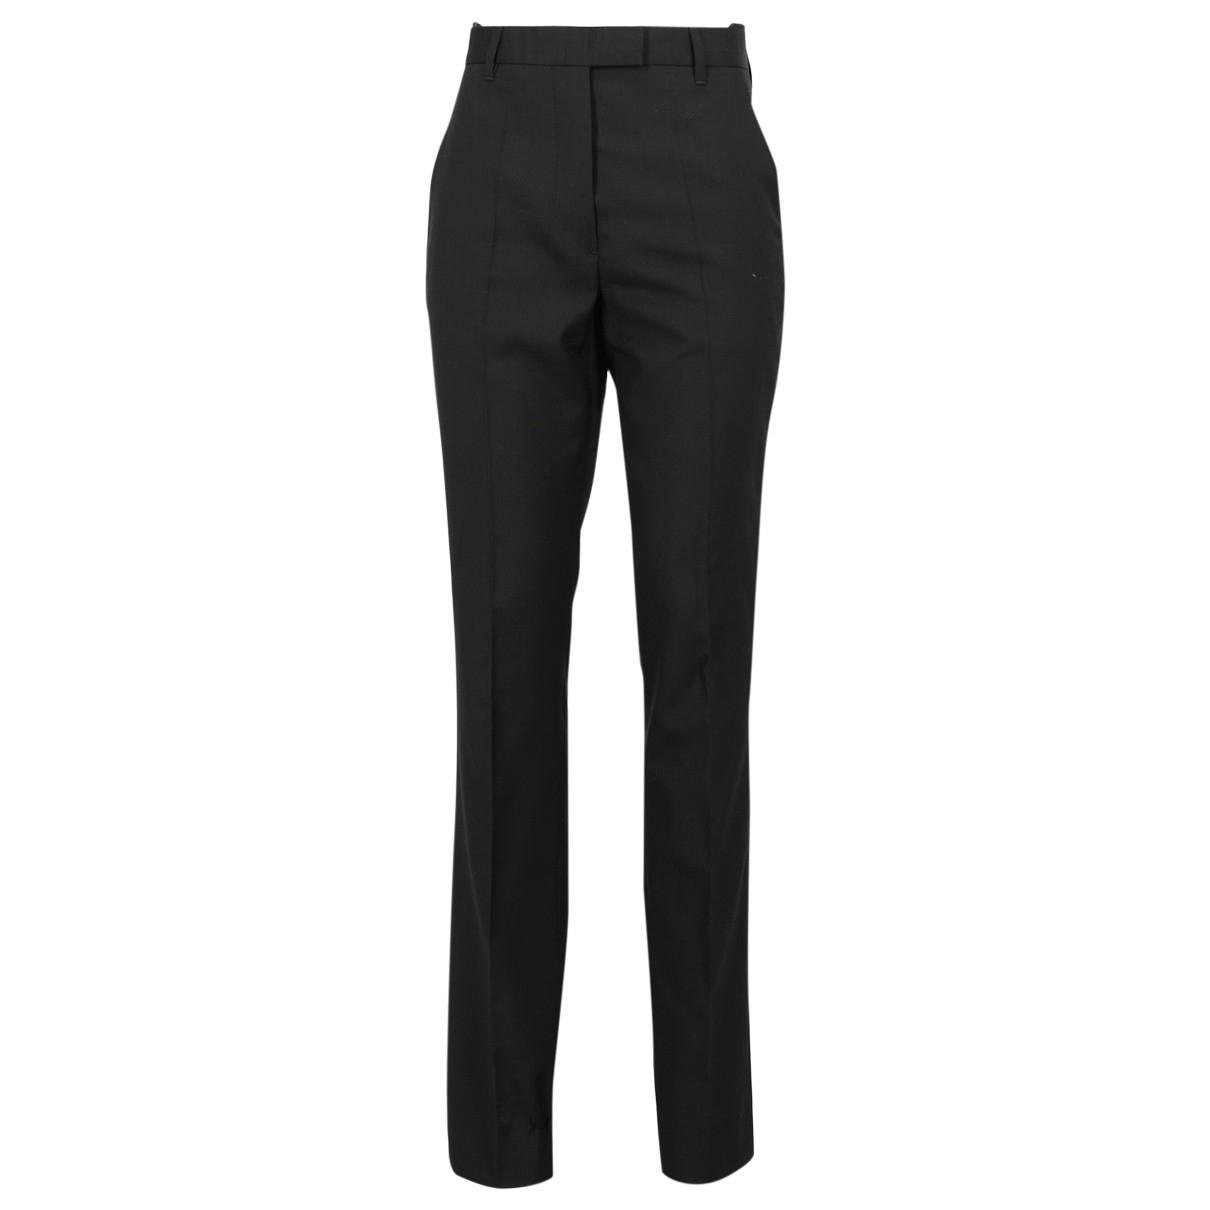 Helmut Lang \N Black Trousers for Women 42 IT